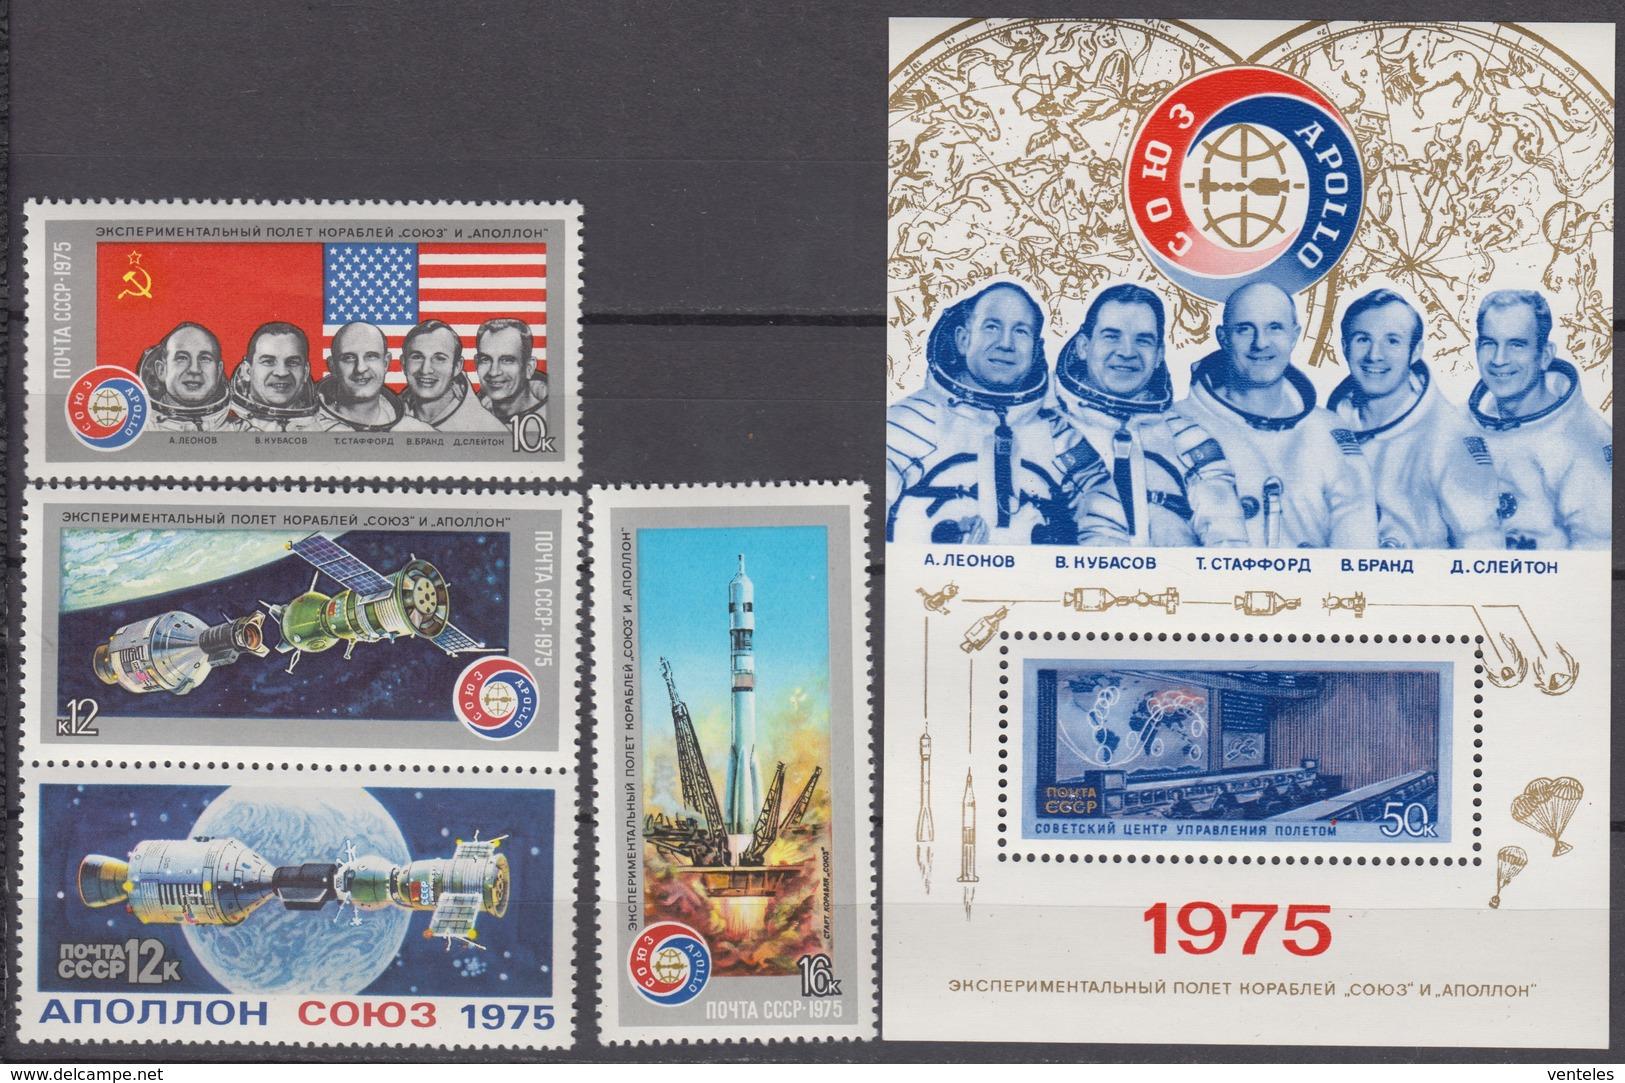 Russia, USSR 15.07.1975 Mi # 4371-74 Bl 105 Apollo–Soyuz Test Project MNH OG - Nuevos